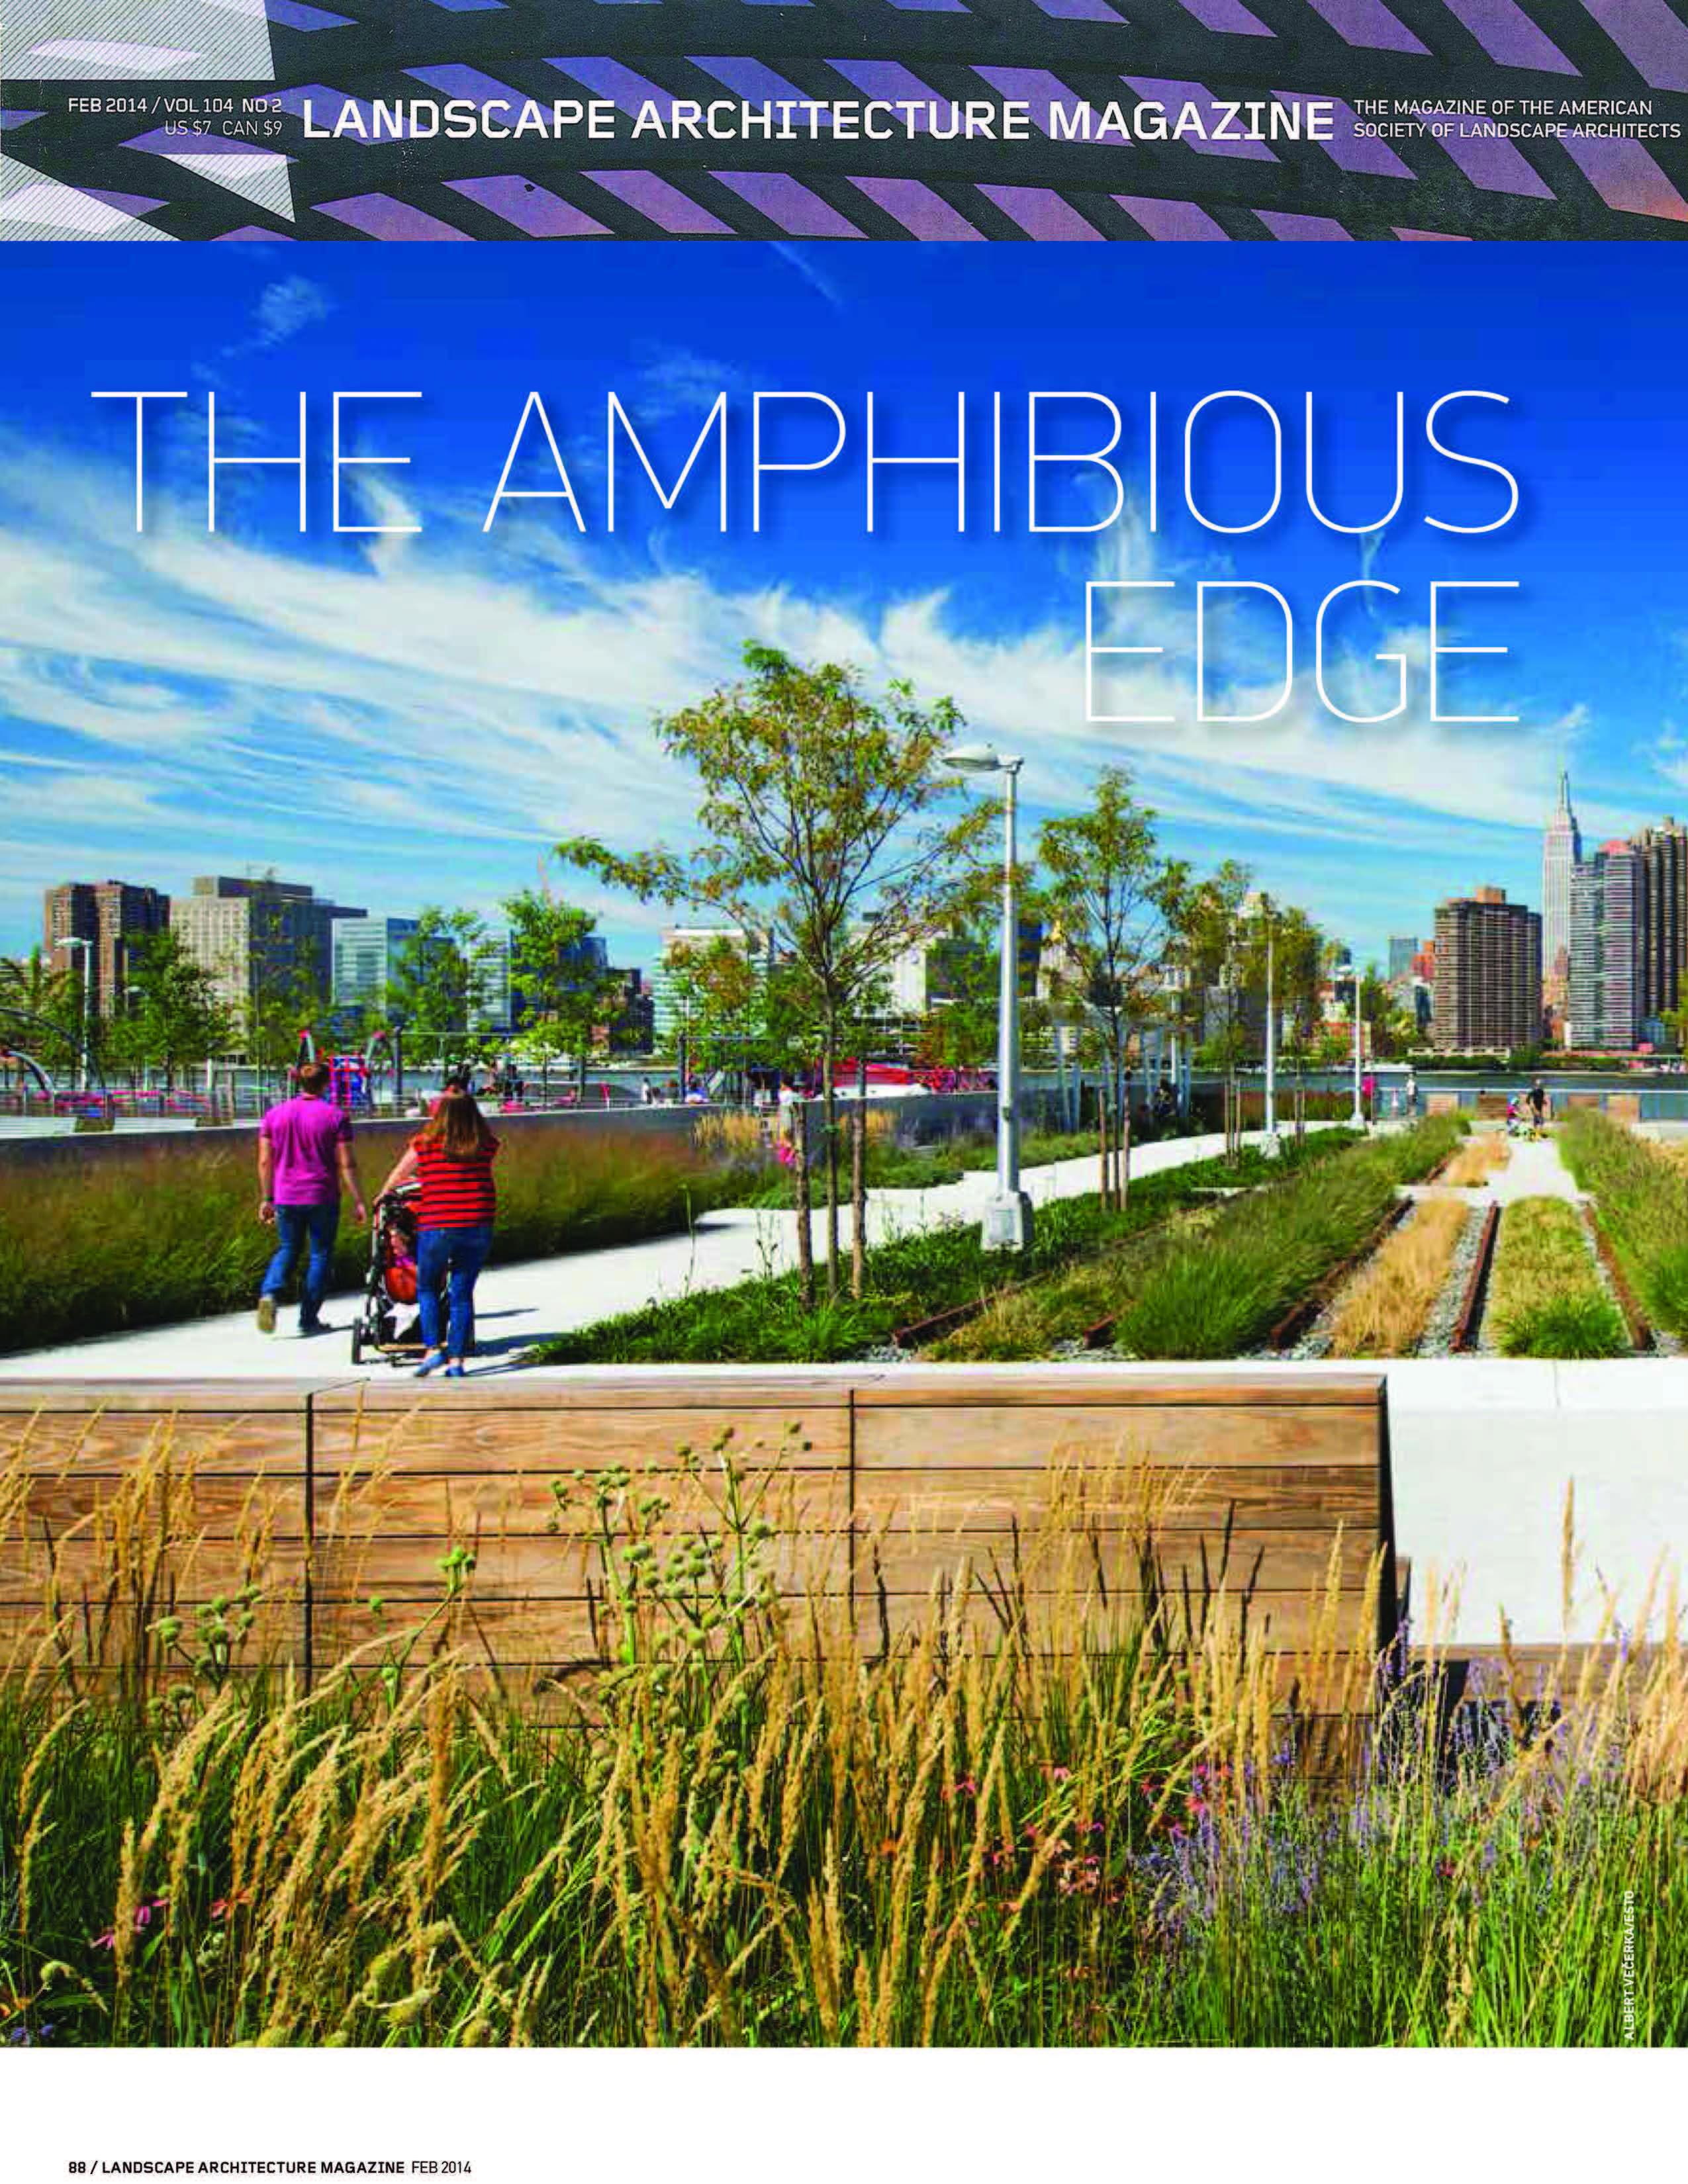 Swabalsley landscape architecture magazine thecheapjerseys Choice Image